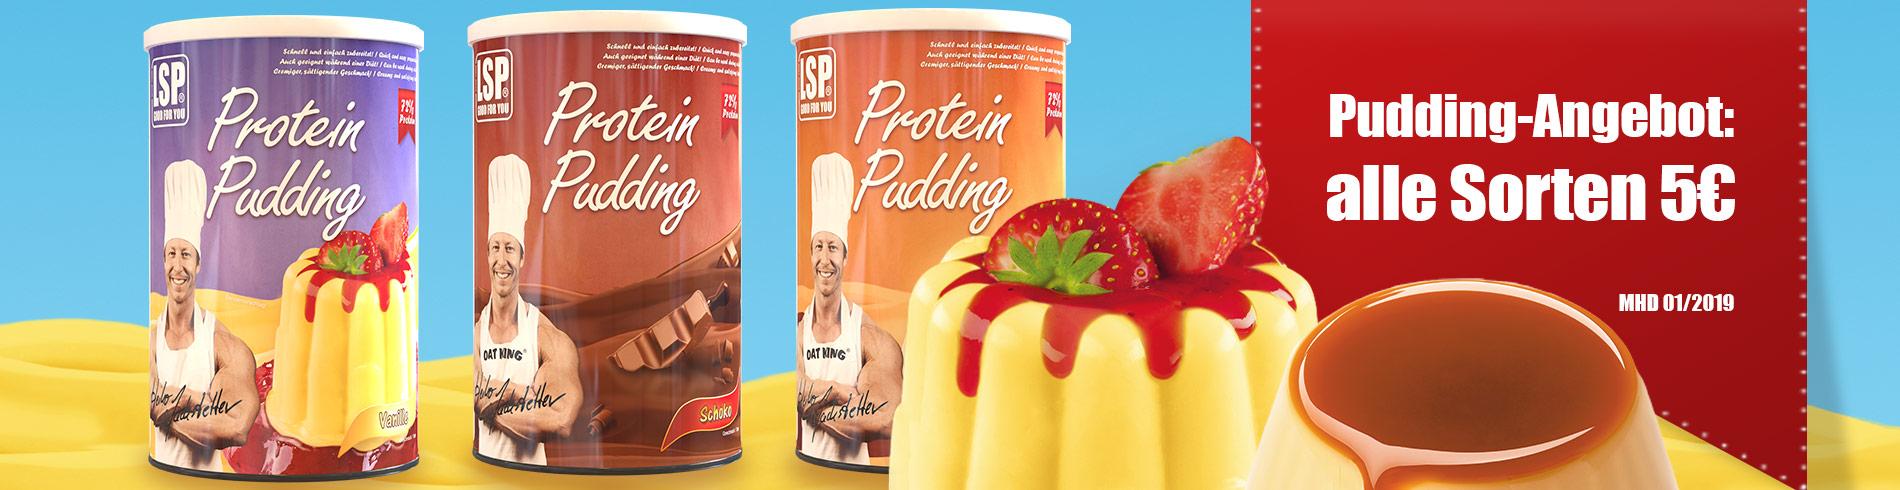 Pudding-Angebot: alle Sorten 5€